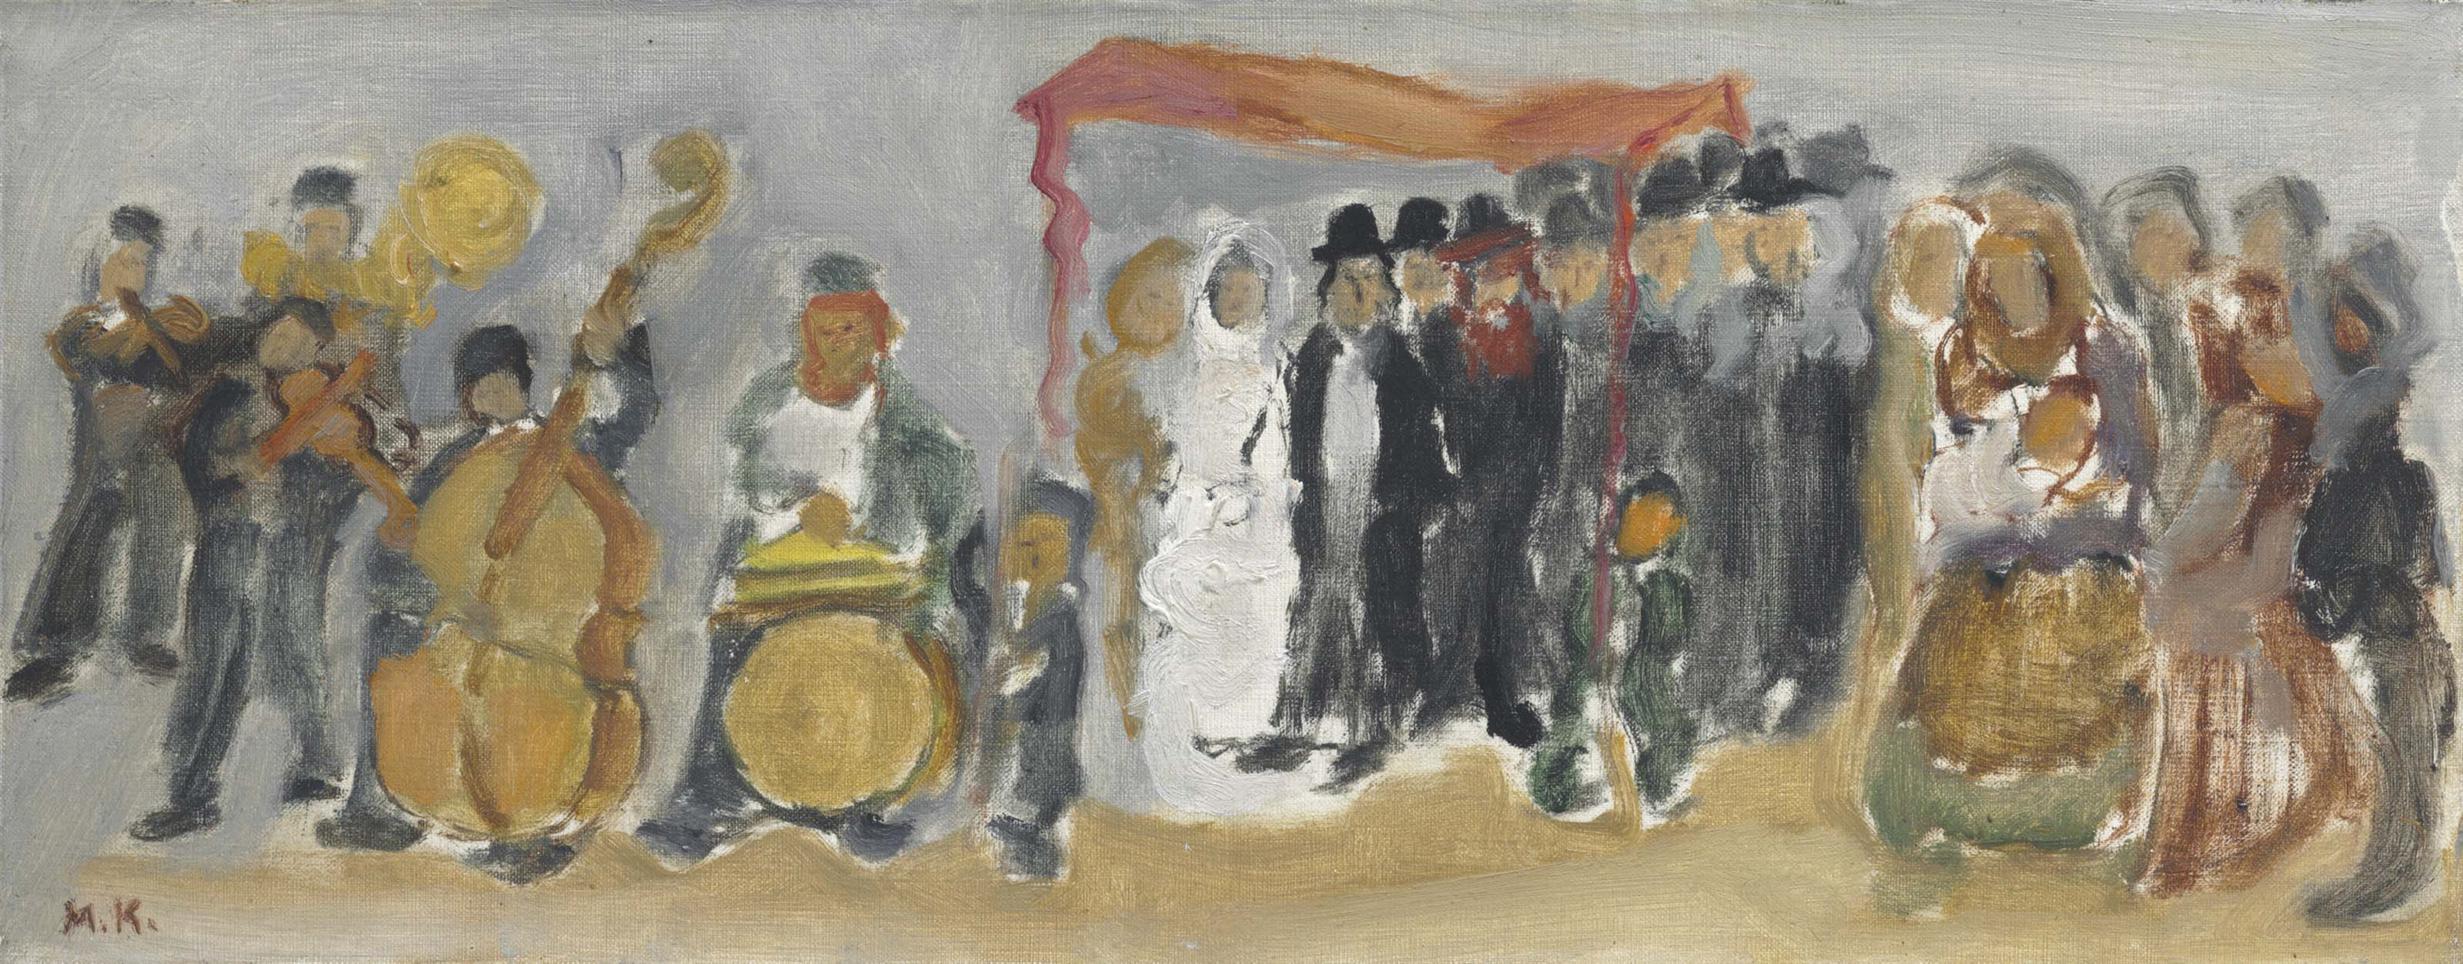 Mane-Katz-Wedding-1959